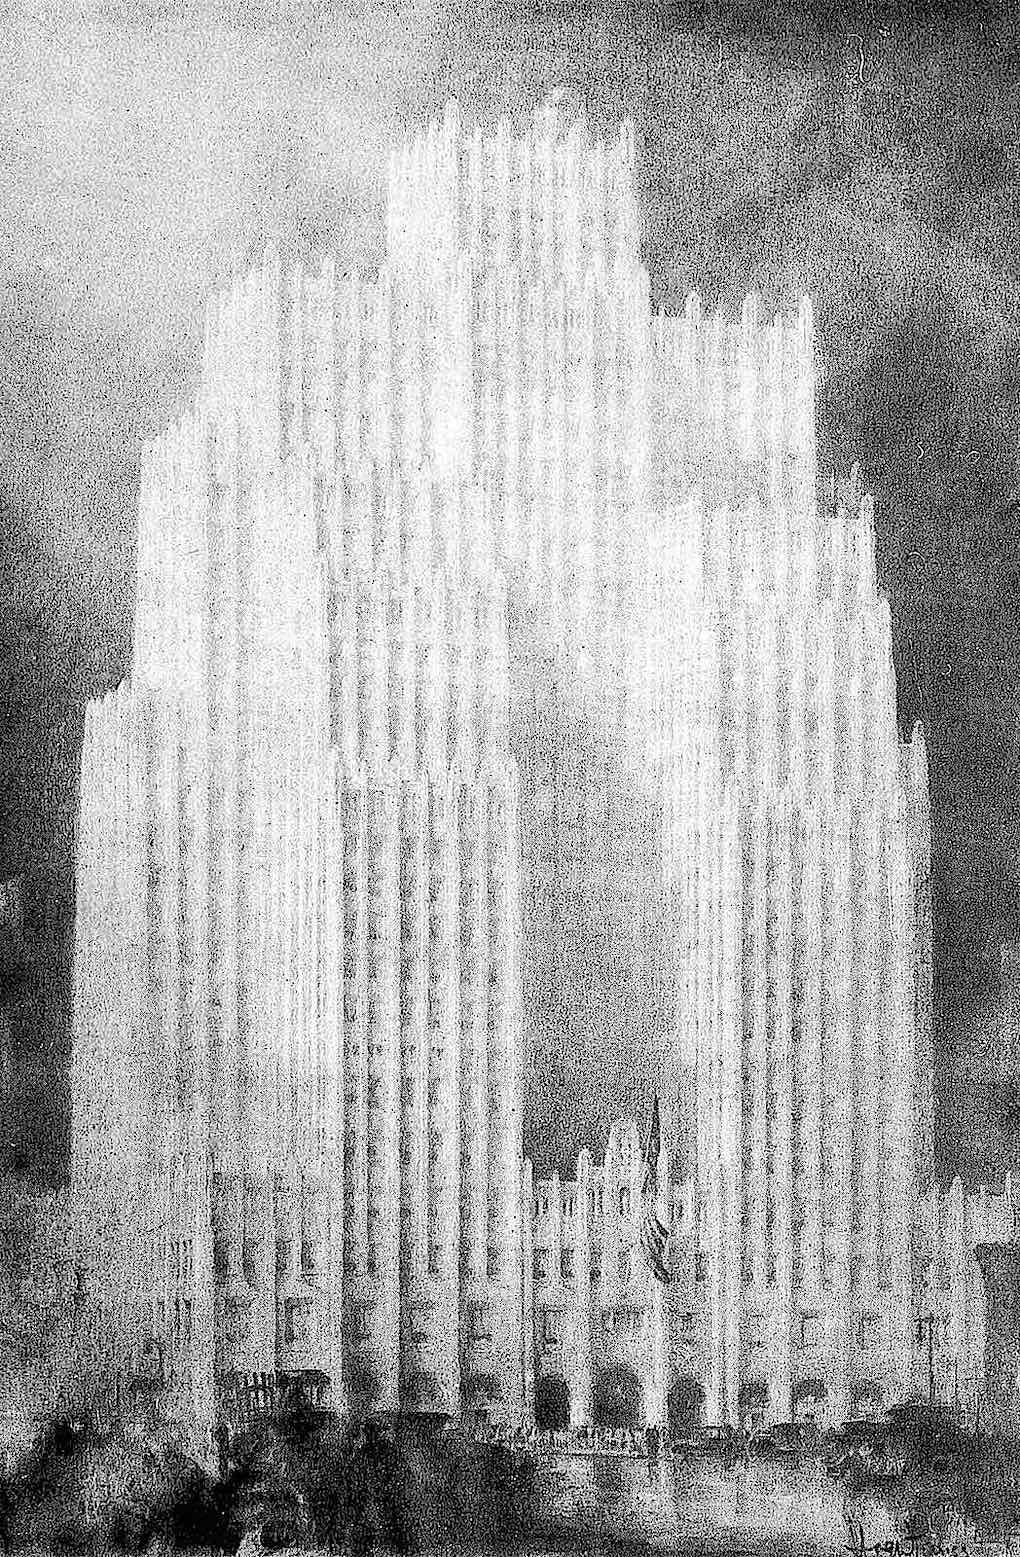 Hugh Ferriss 1929, a giant building